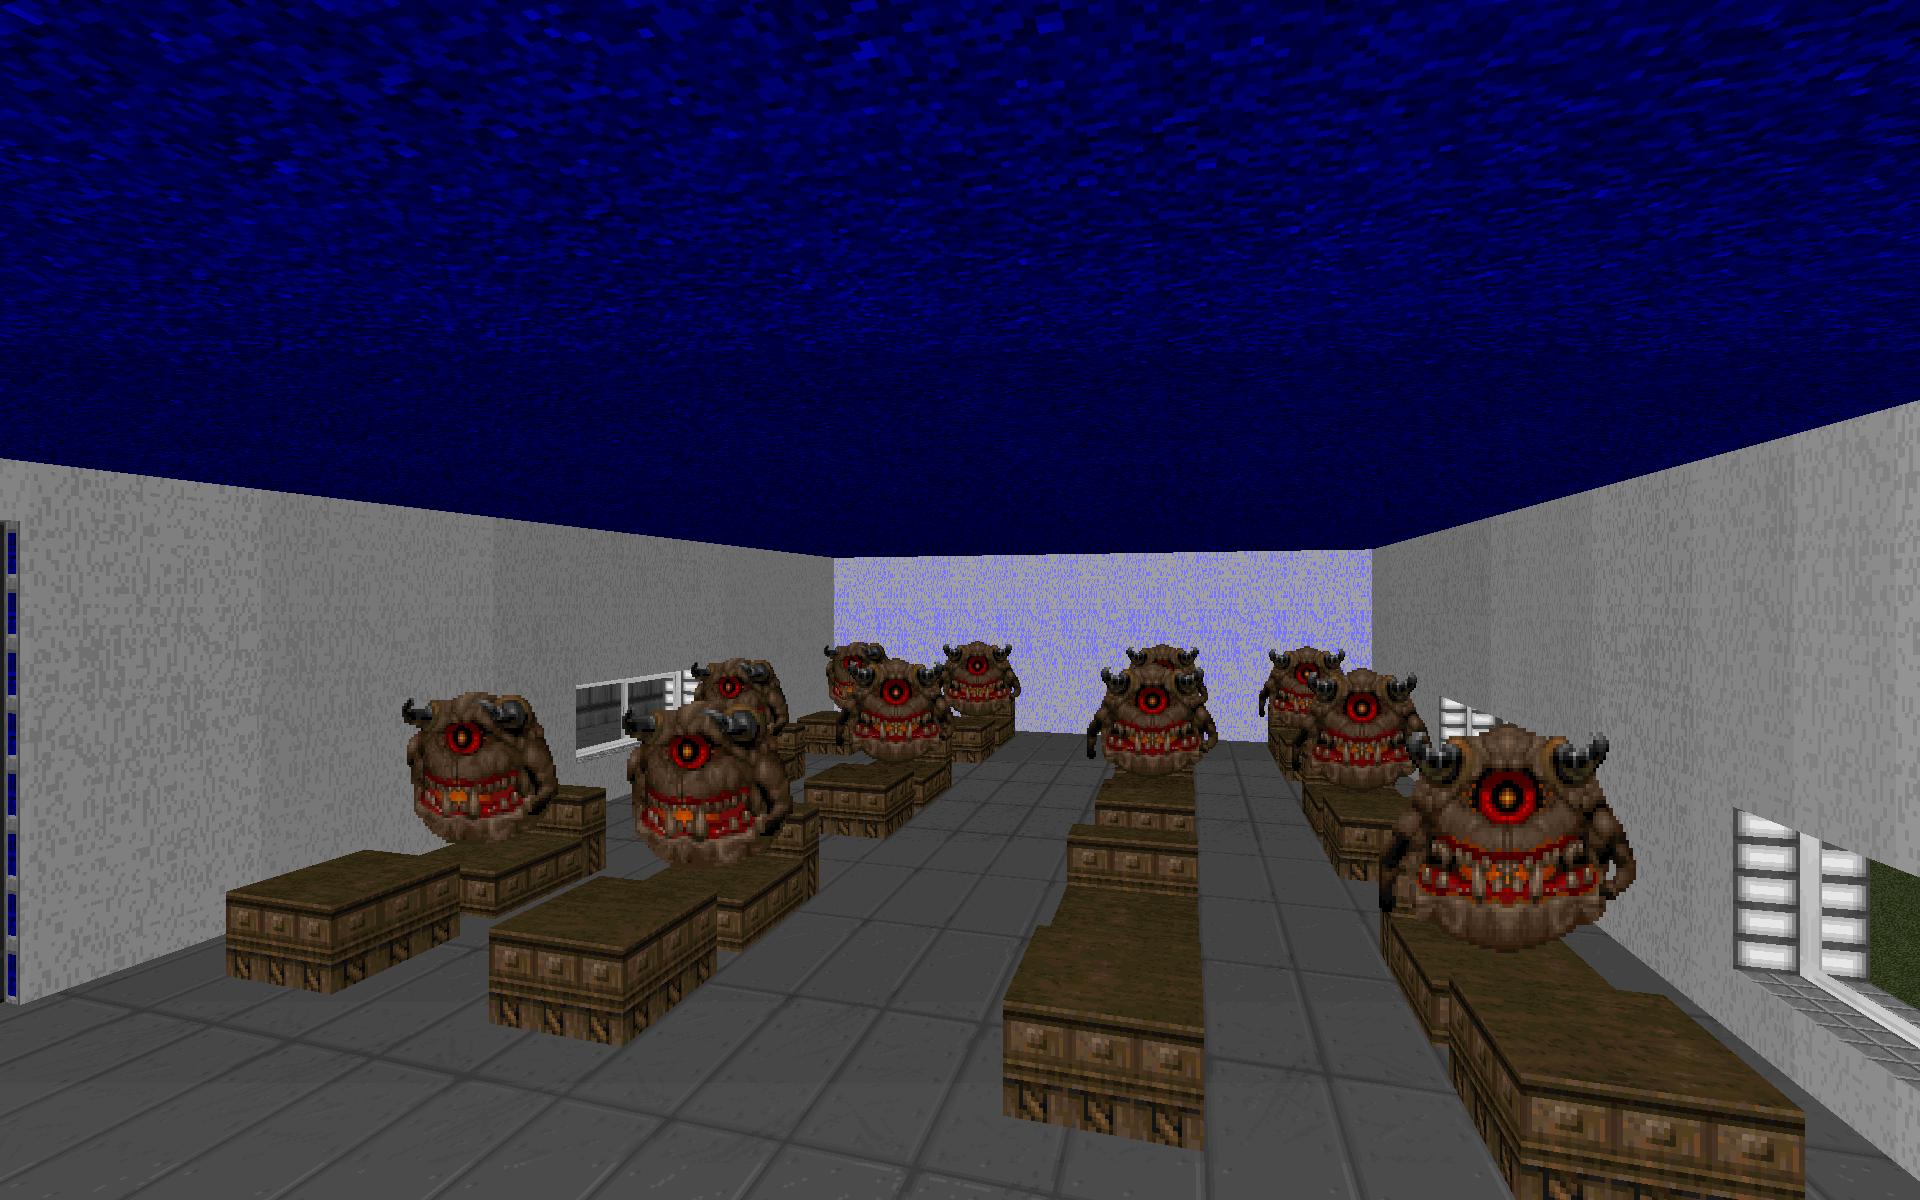 Screenshot_Doom_20201014_100408.png.a46cc66da7c20a465128d061beaf20c1.png